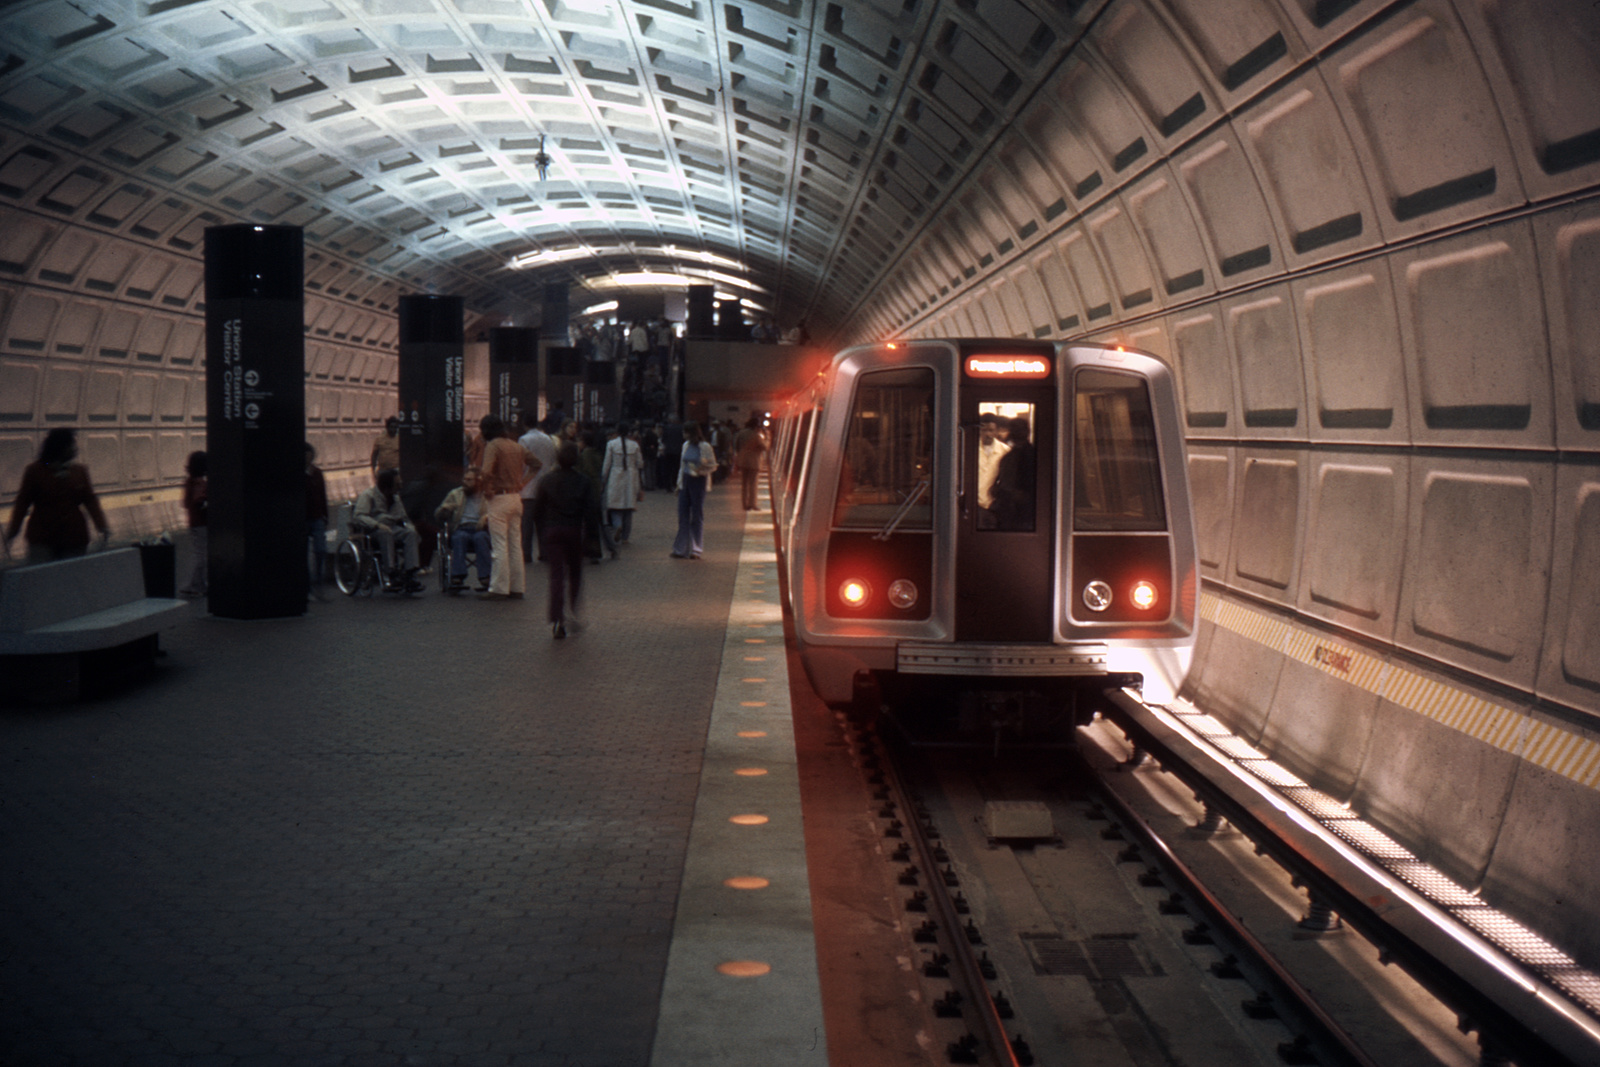 (366k, 1024x683)<br><b>Country:</b> United States<br><b>City:</b> Washington, D.C.<br><b>System:</b> Washington Metro (WMATA)<br><b>Line:</b> WMATA Red Line<br><b>Location:</b> Union Station <br><b>Collection of:</b> David Pirmann<br><b>Date:</b> 4/1976<br><b>Viewed (this week/total):</b> 0 / 8151